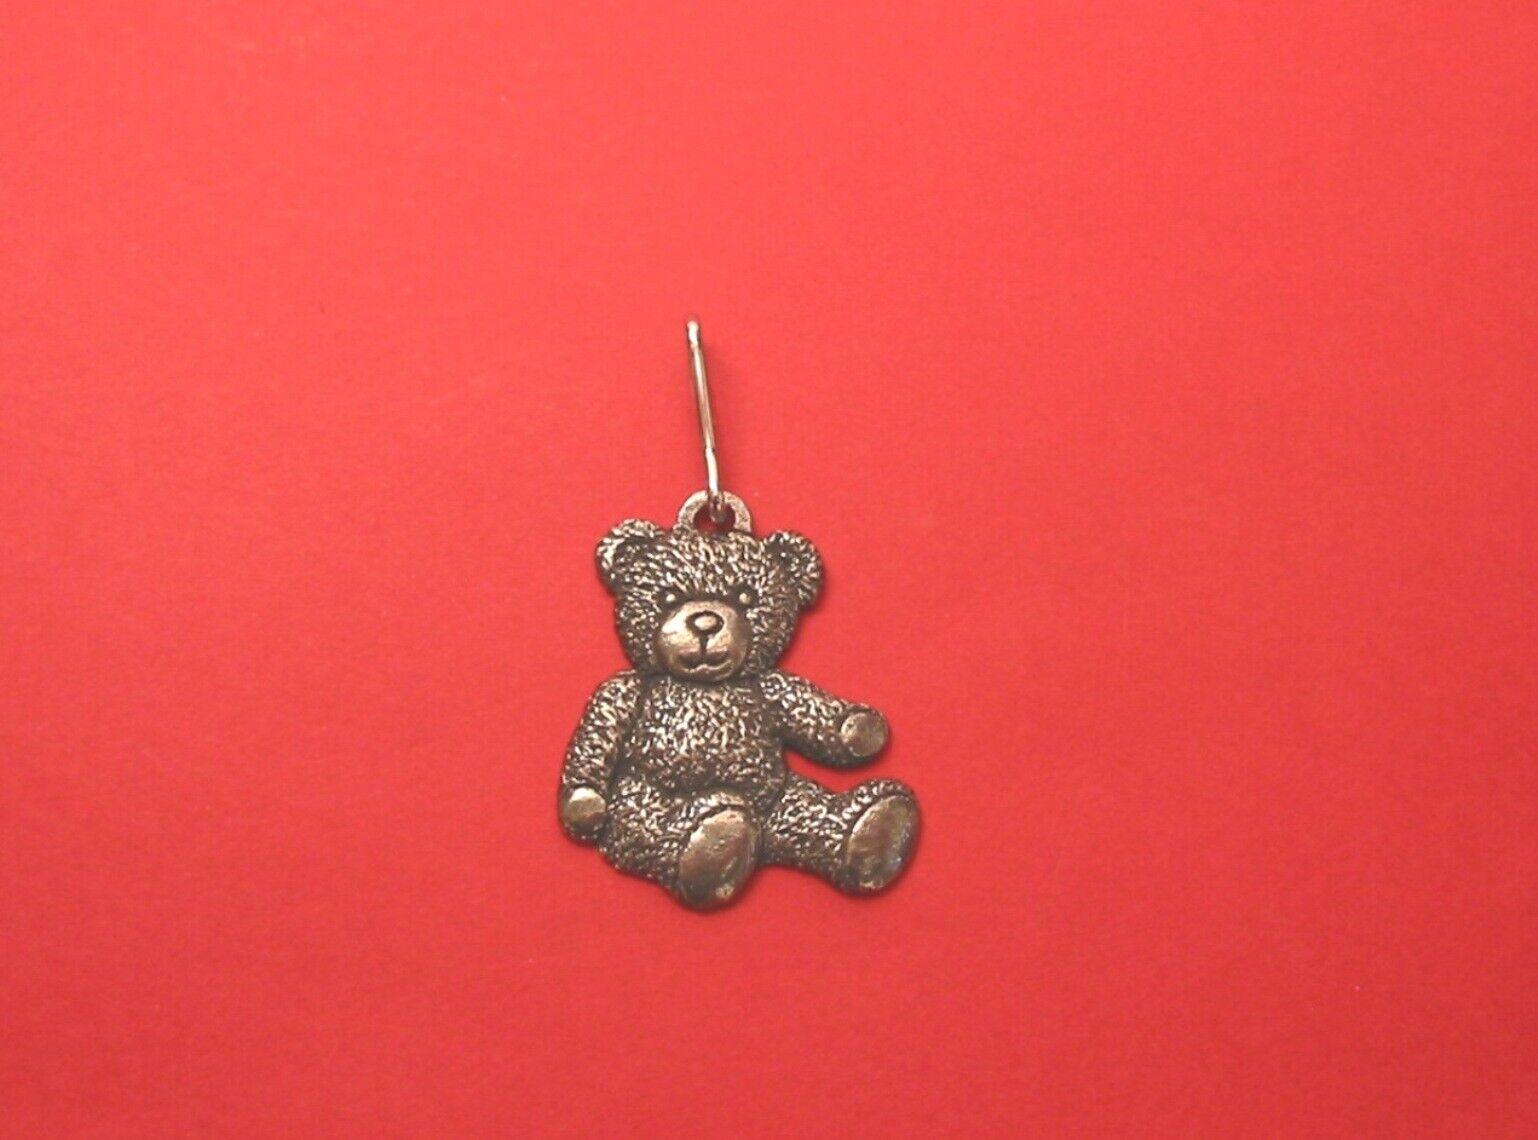 Teddy Bear Pewter Zipper Pull Teddy Bear Gift Mum Daughter Xmas Gift Teddy Gift